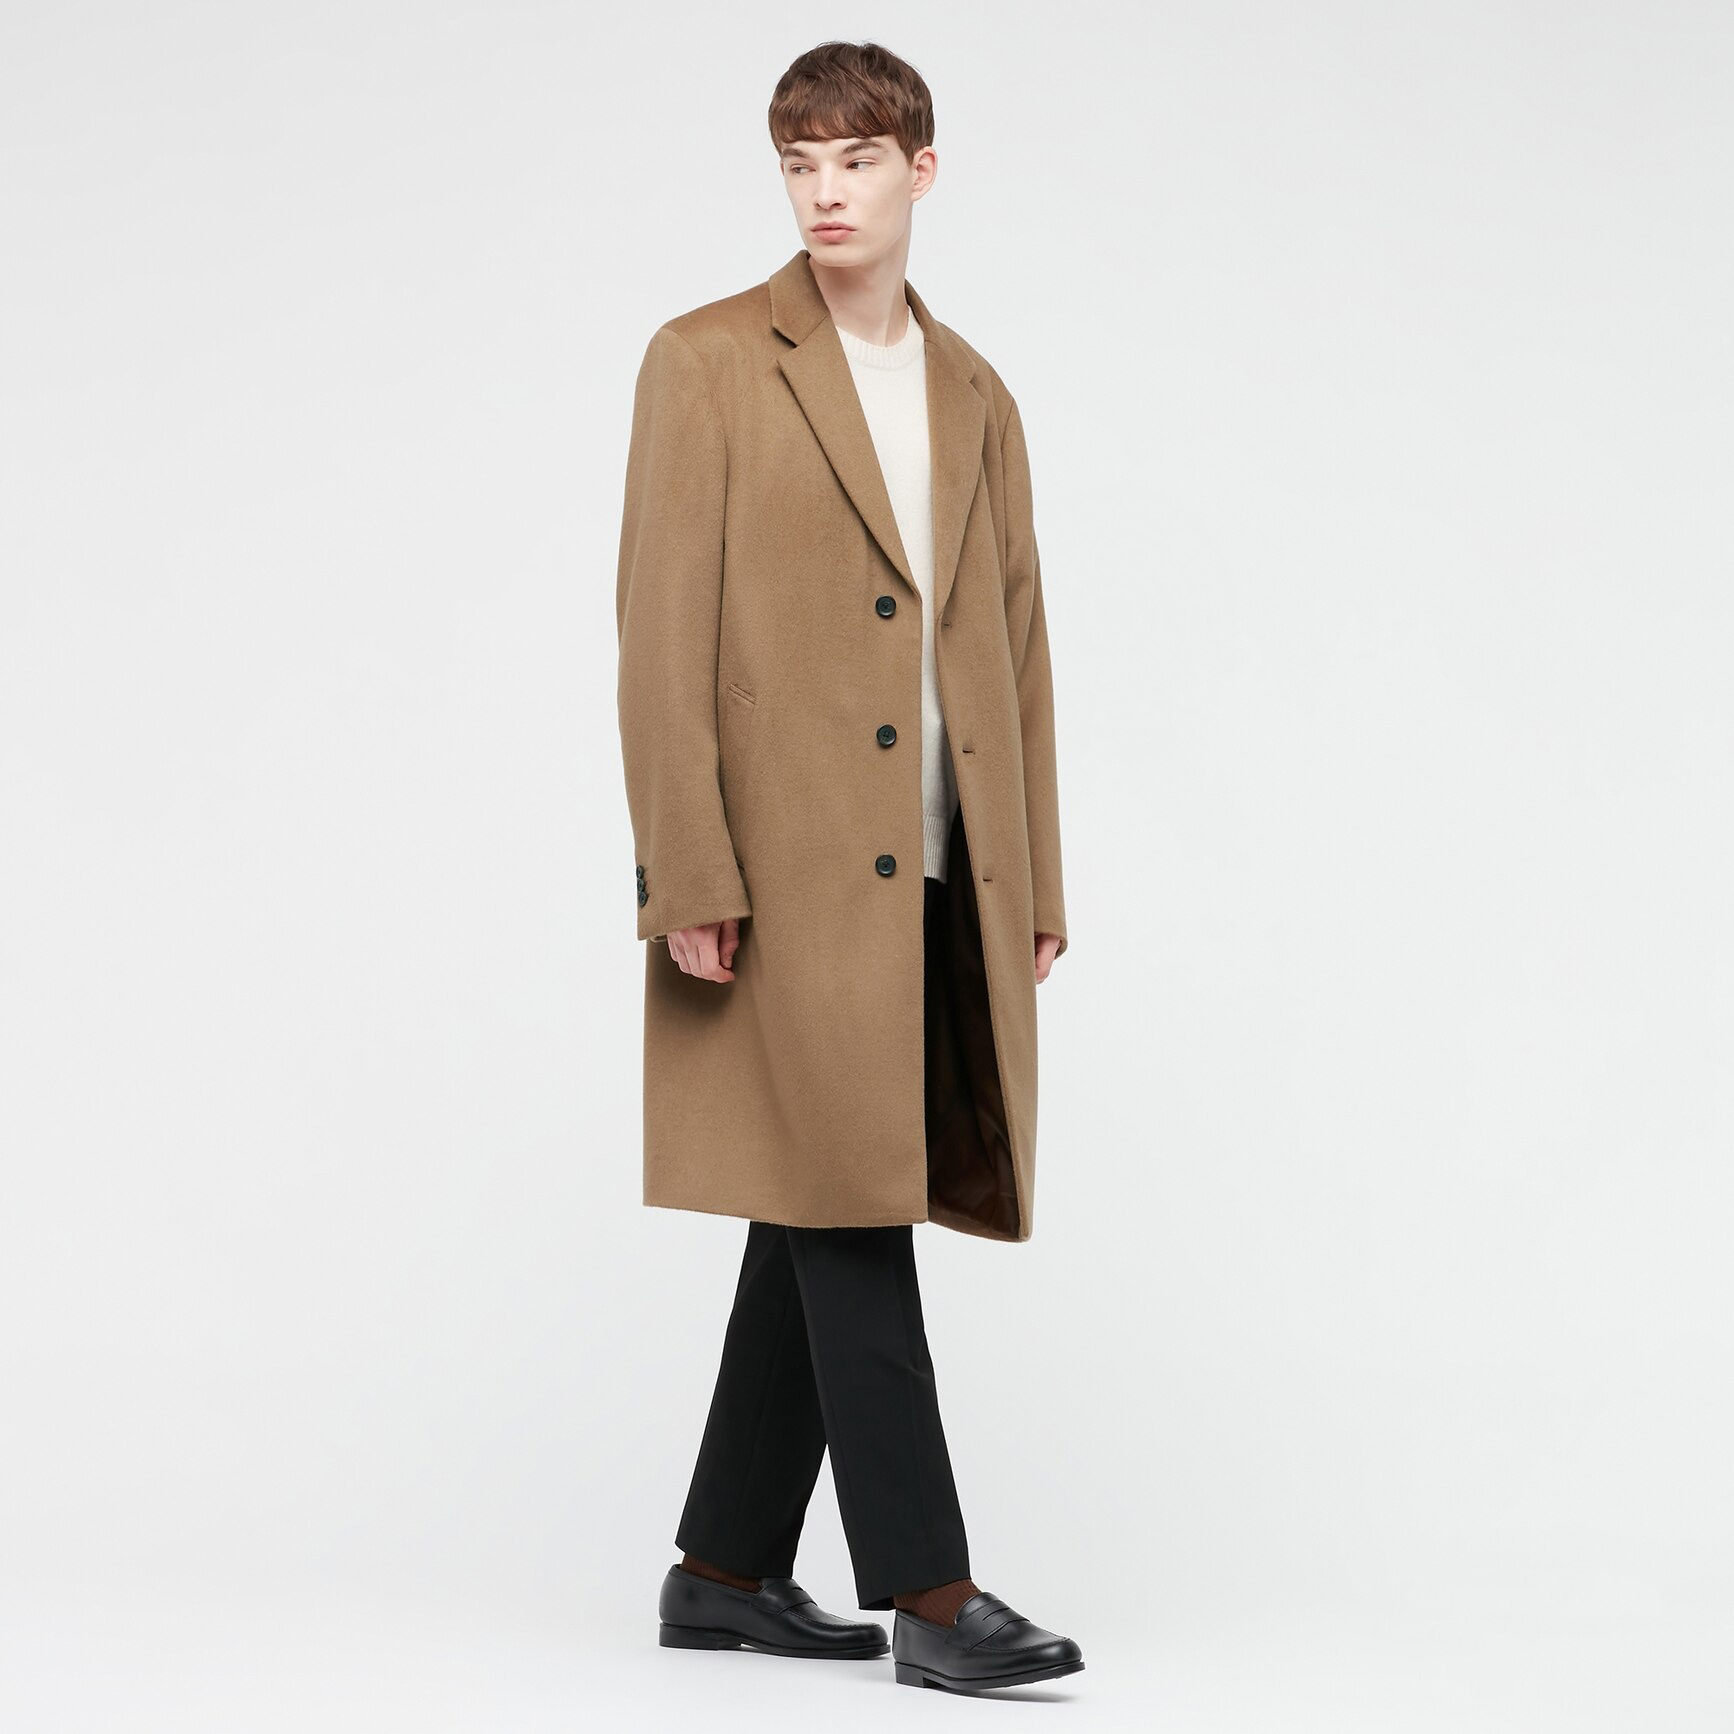 Uniqlo Wool Cashmere Chesterfield Winter Coat